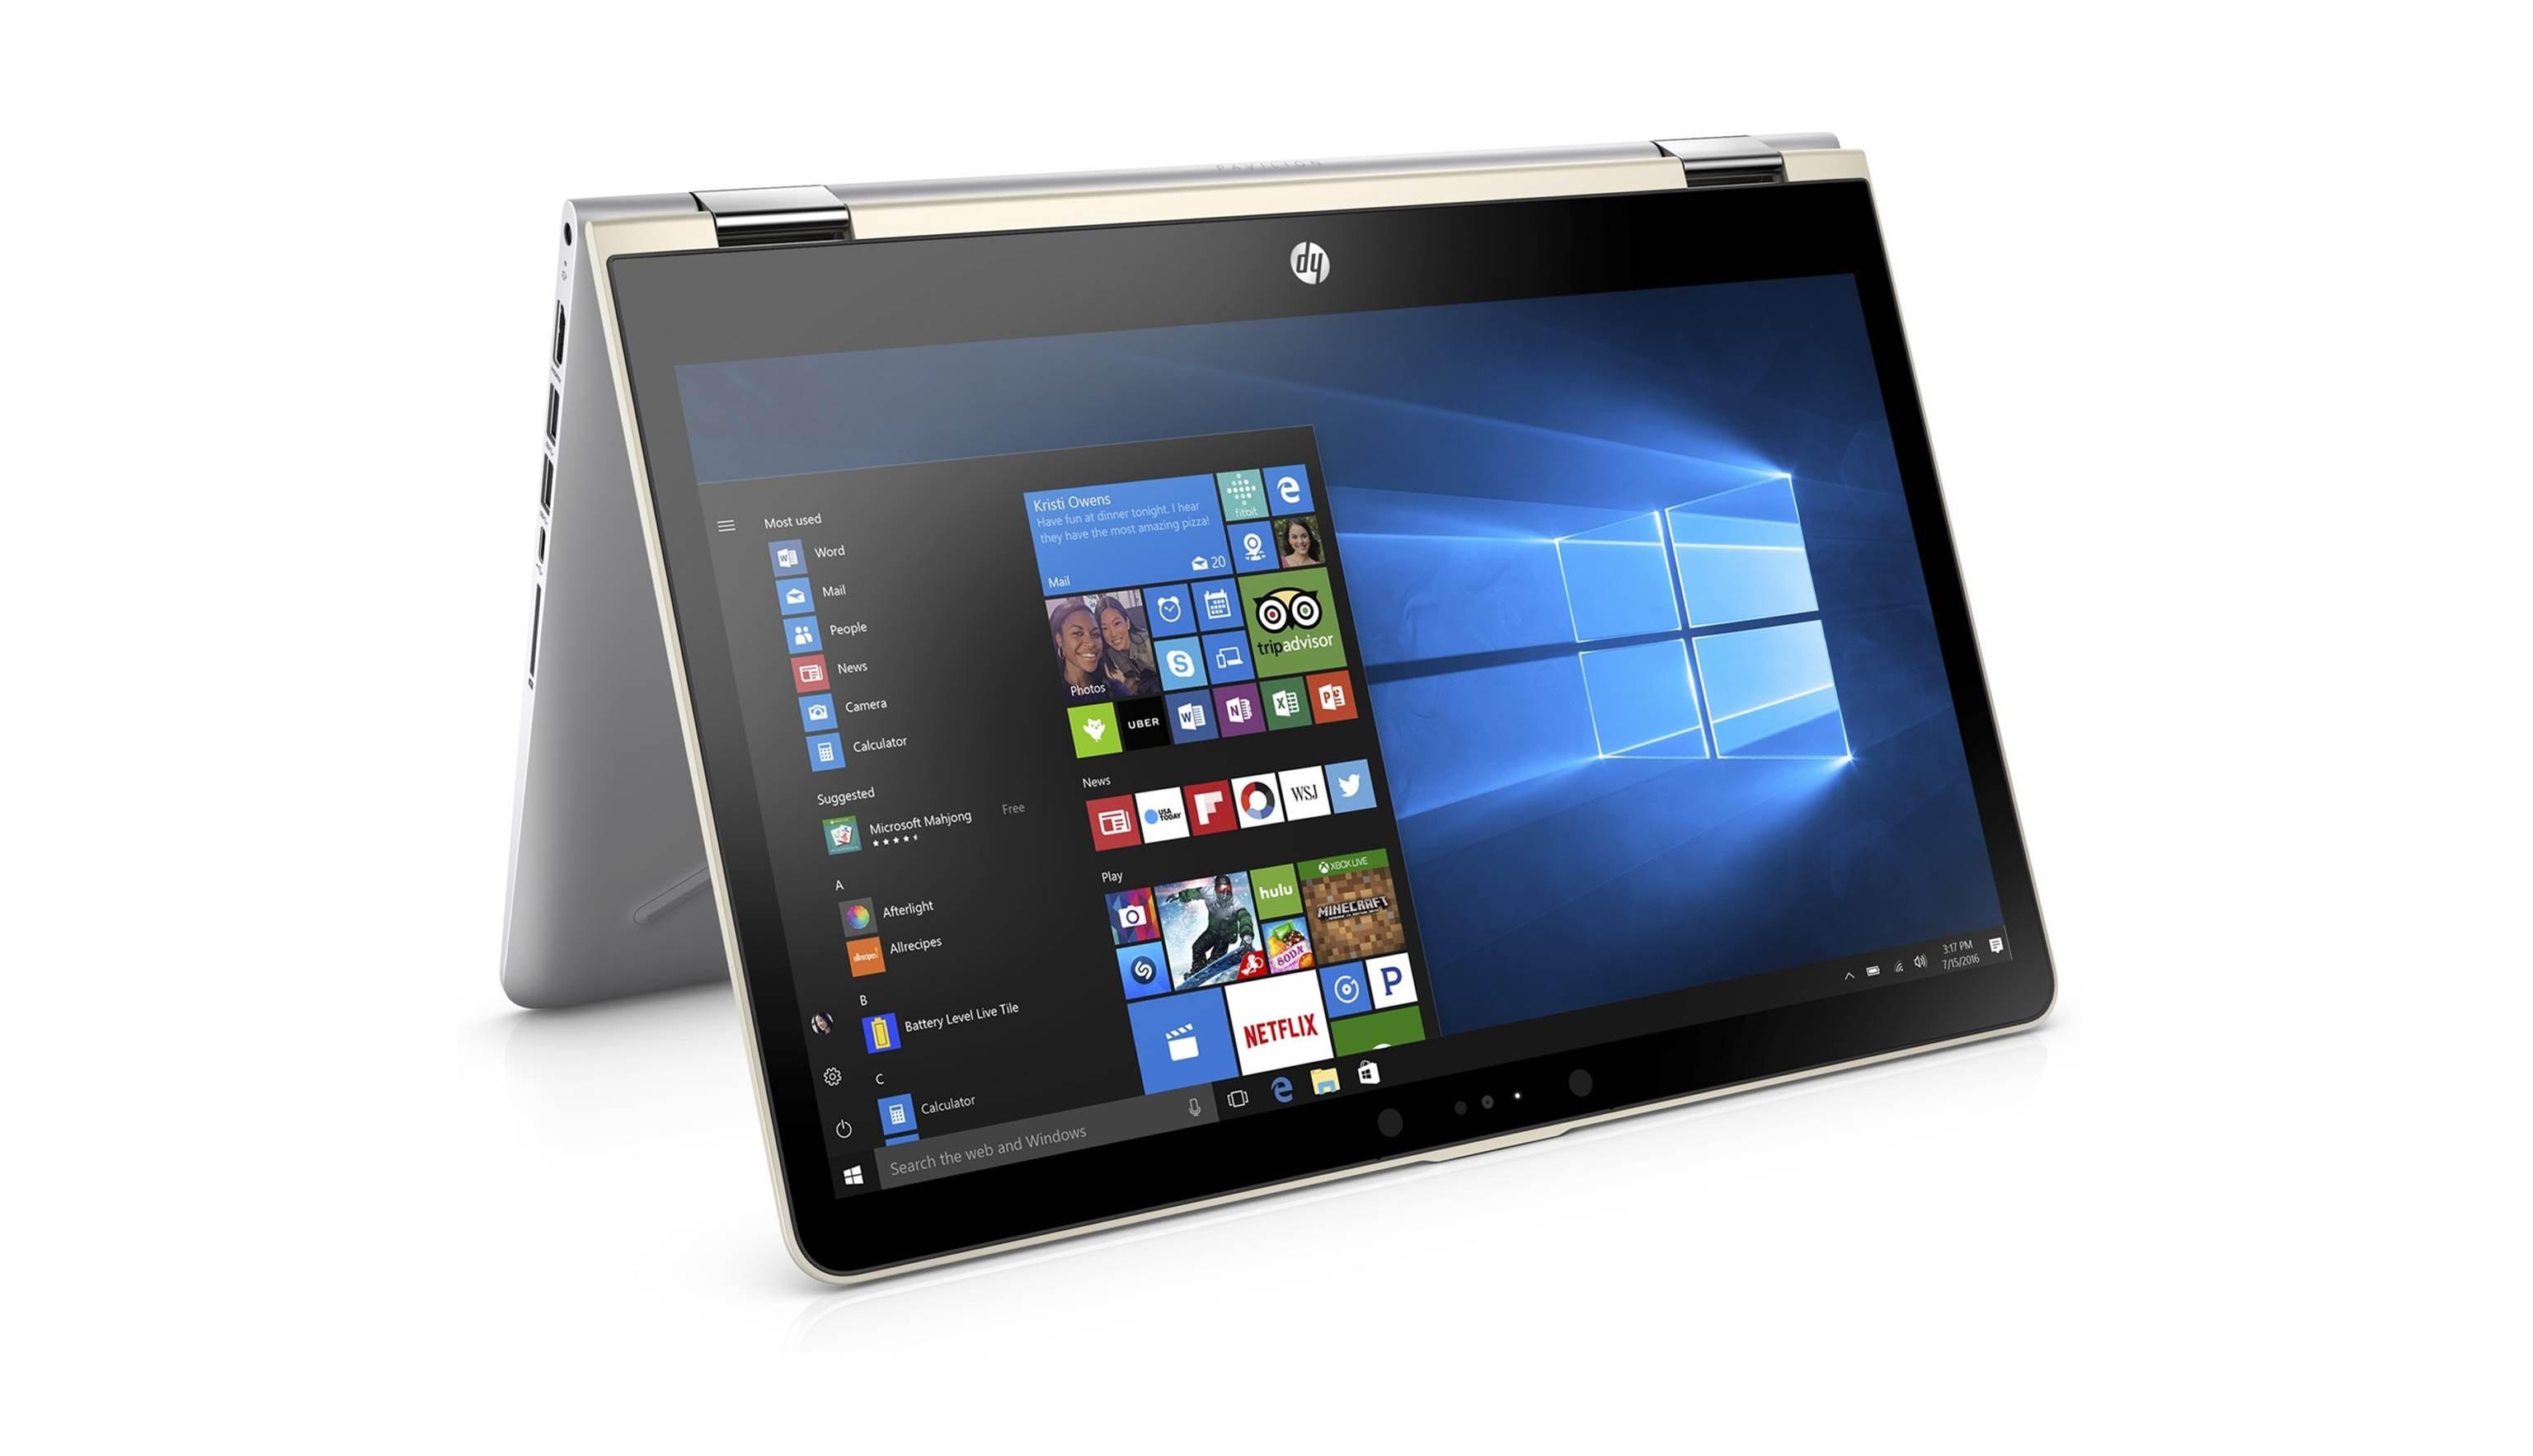 HP Pavilion x360 BA109TX 14 i7 Laptop - Silk Gold - Front Twist